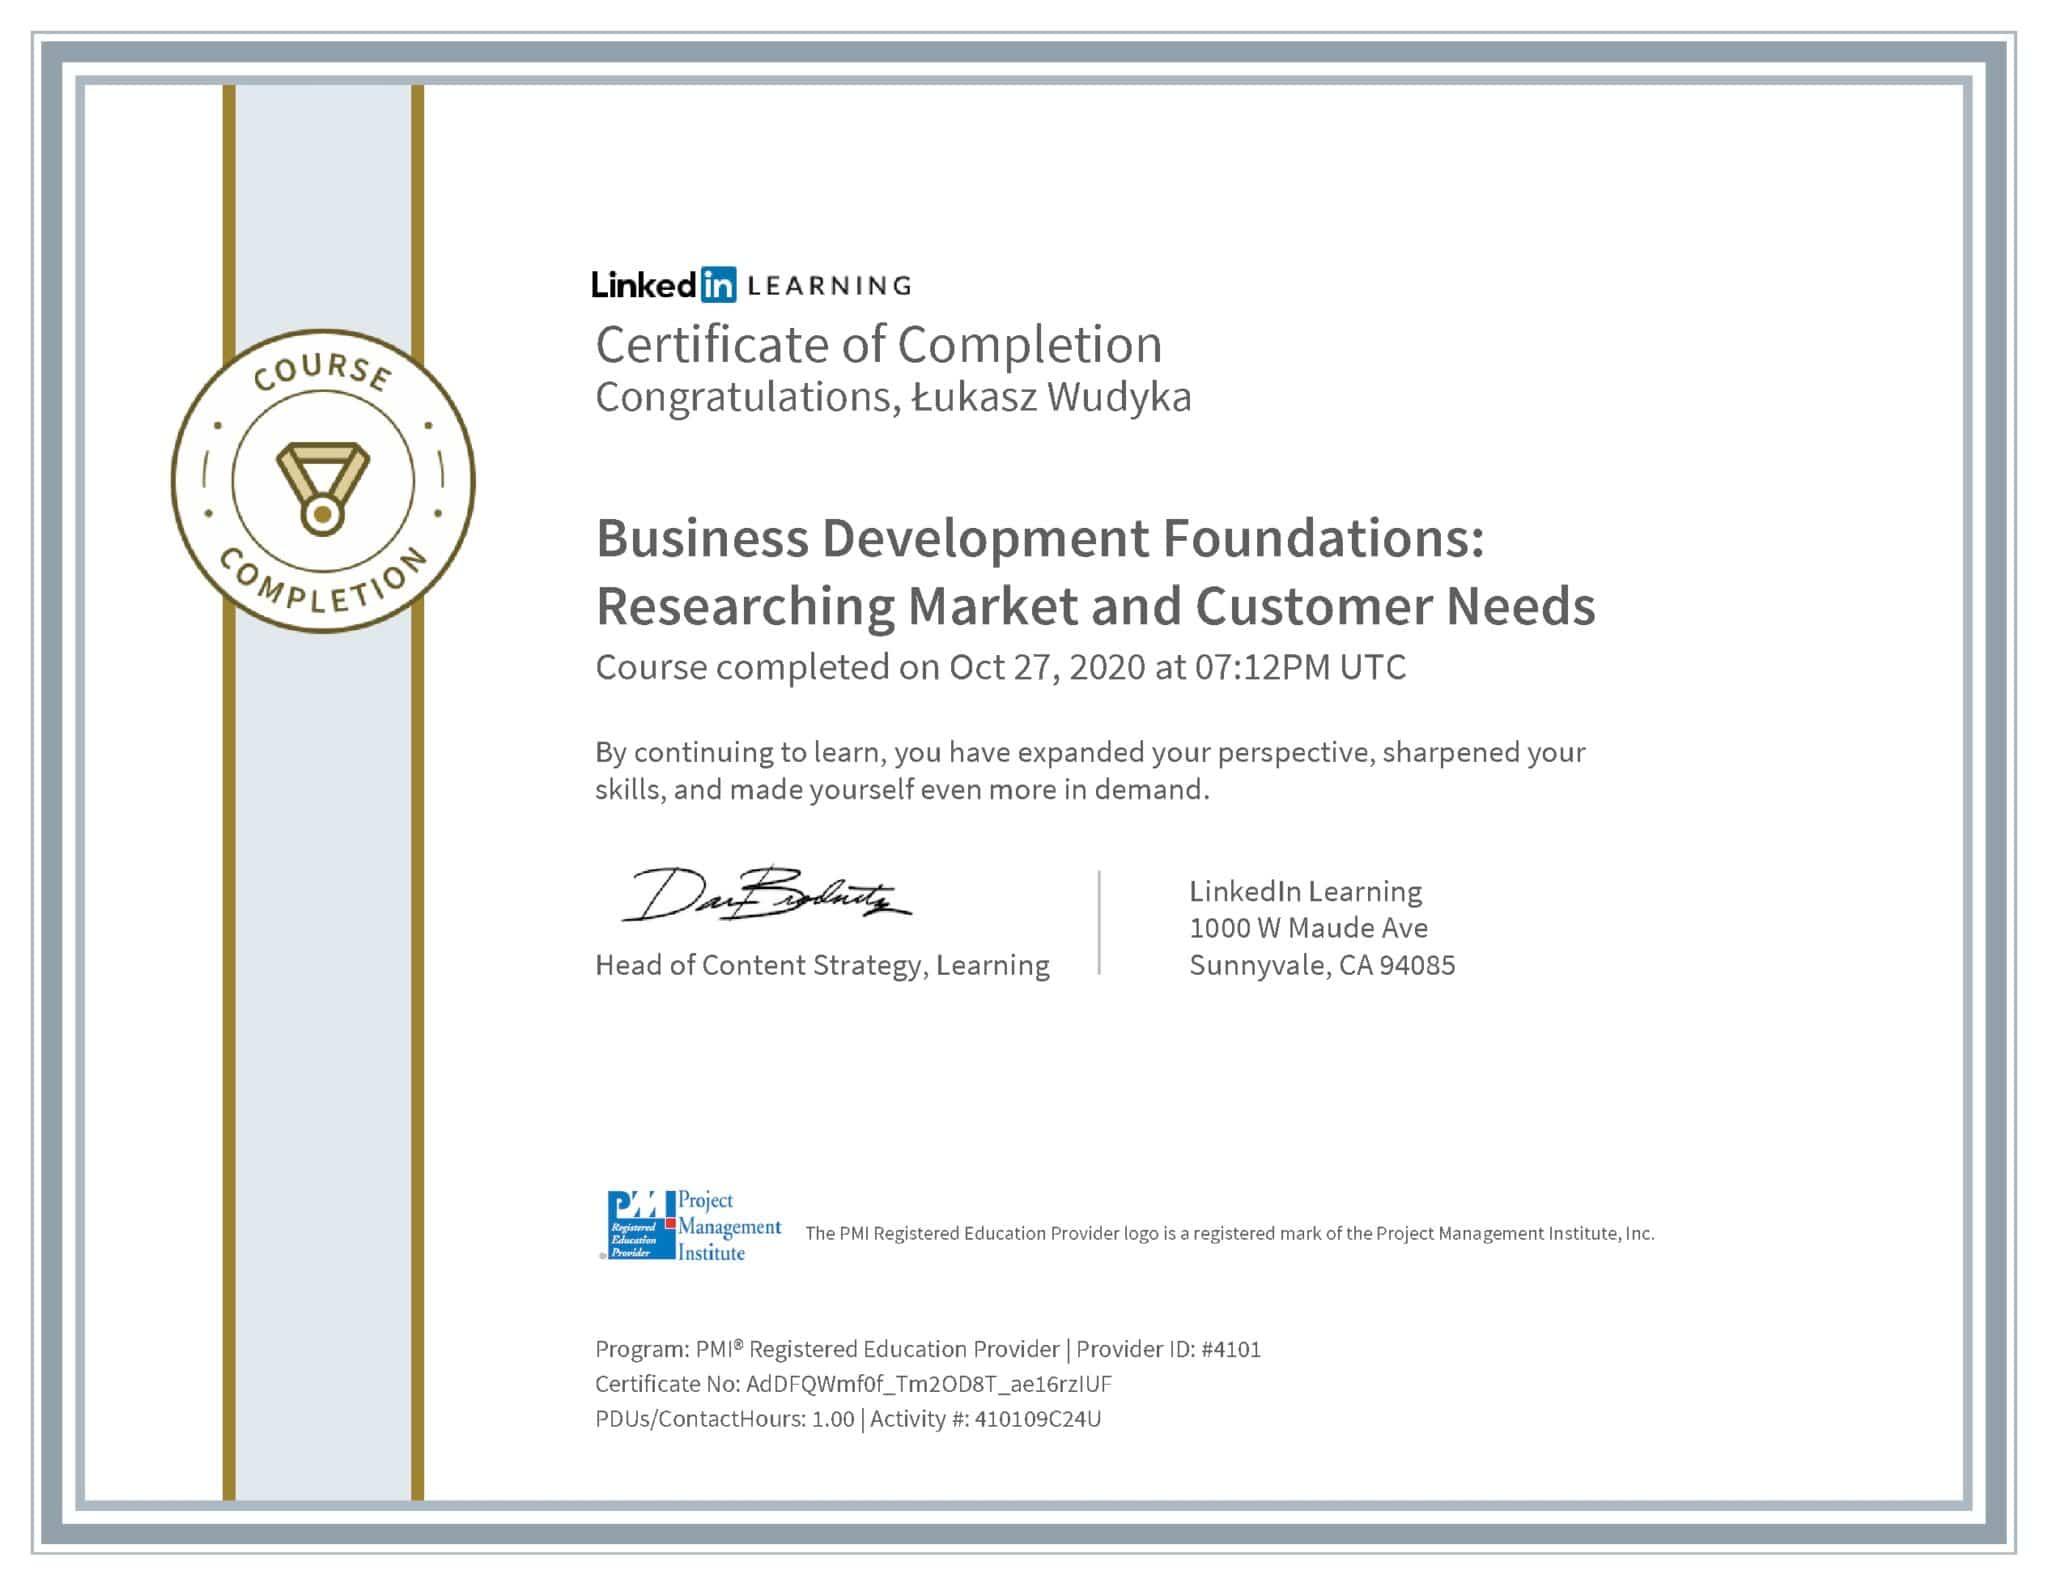 Łukasz Wudyka certyfikat LinkedIn Business Development Foundations: Reserching Market and Customer Needs PMI